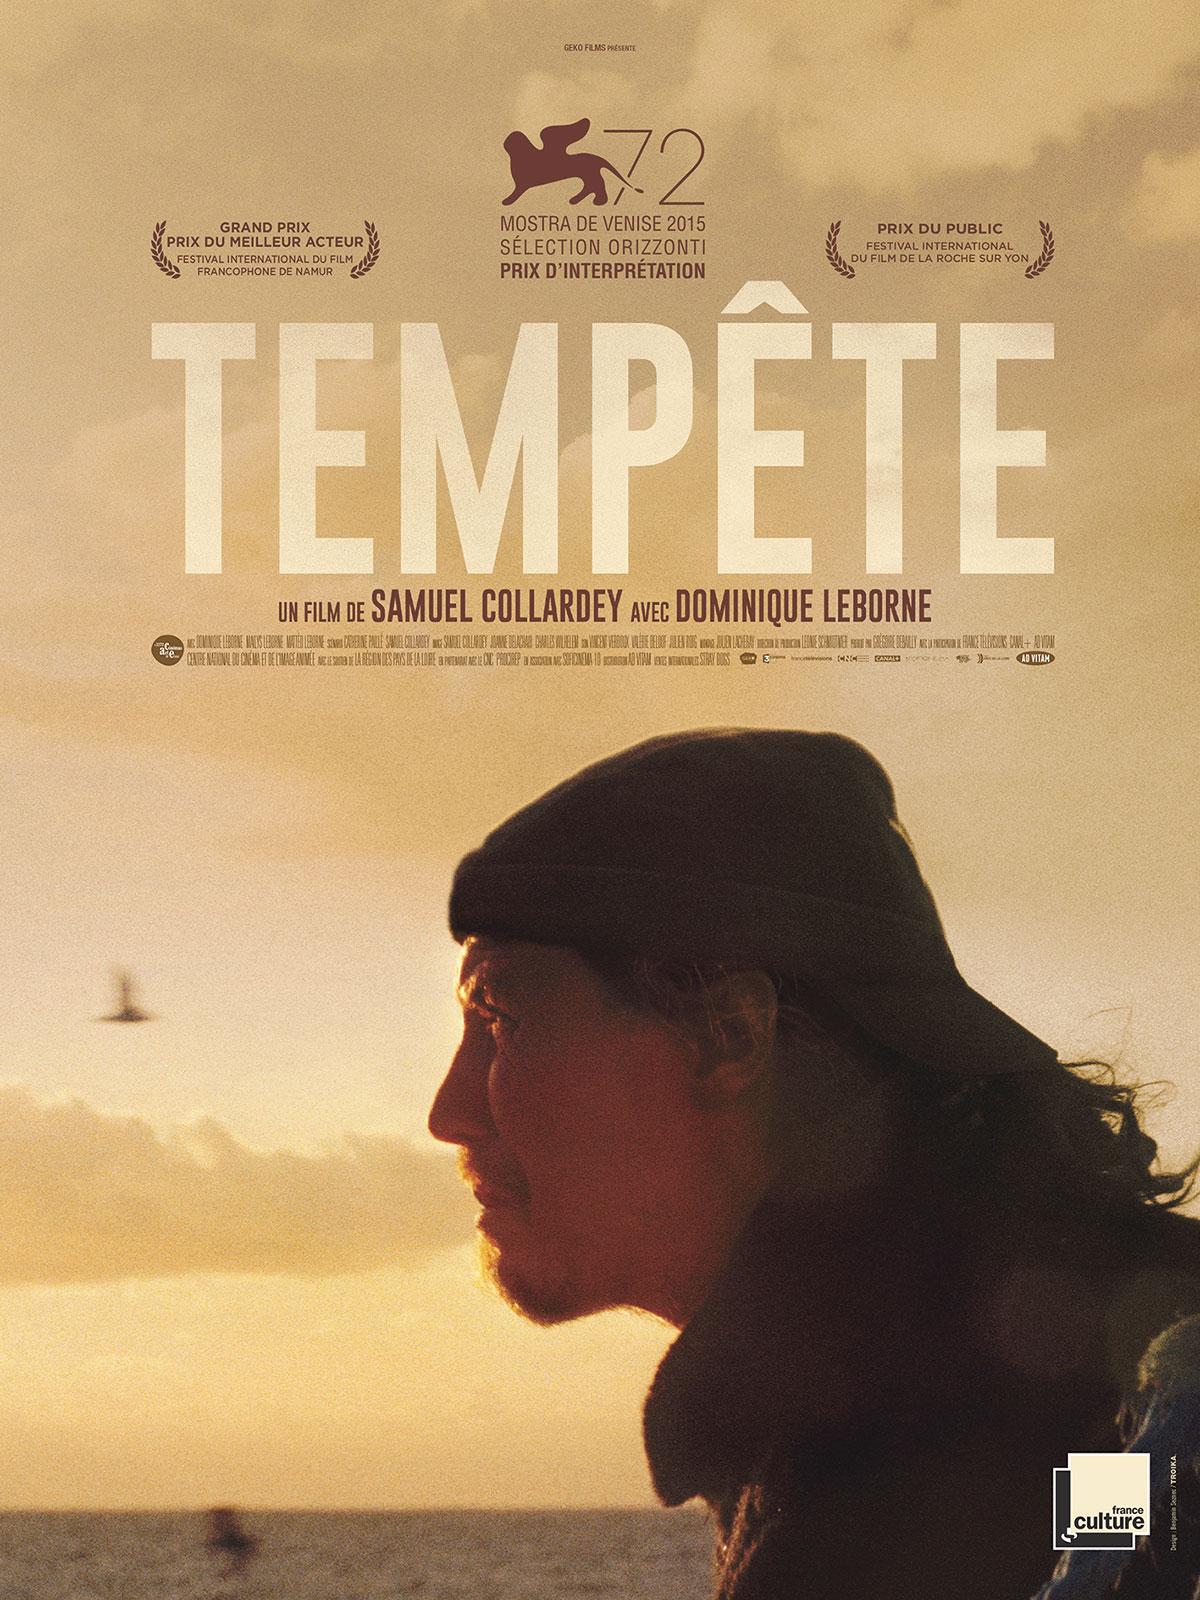 GRATUIT MALABAR TÉLÉCHARGER FILM PRINCESS